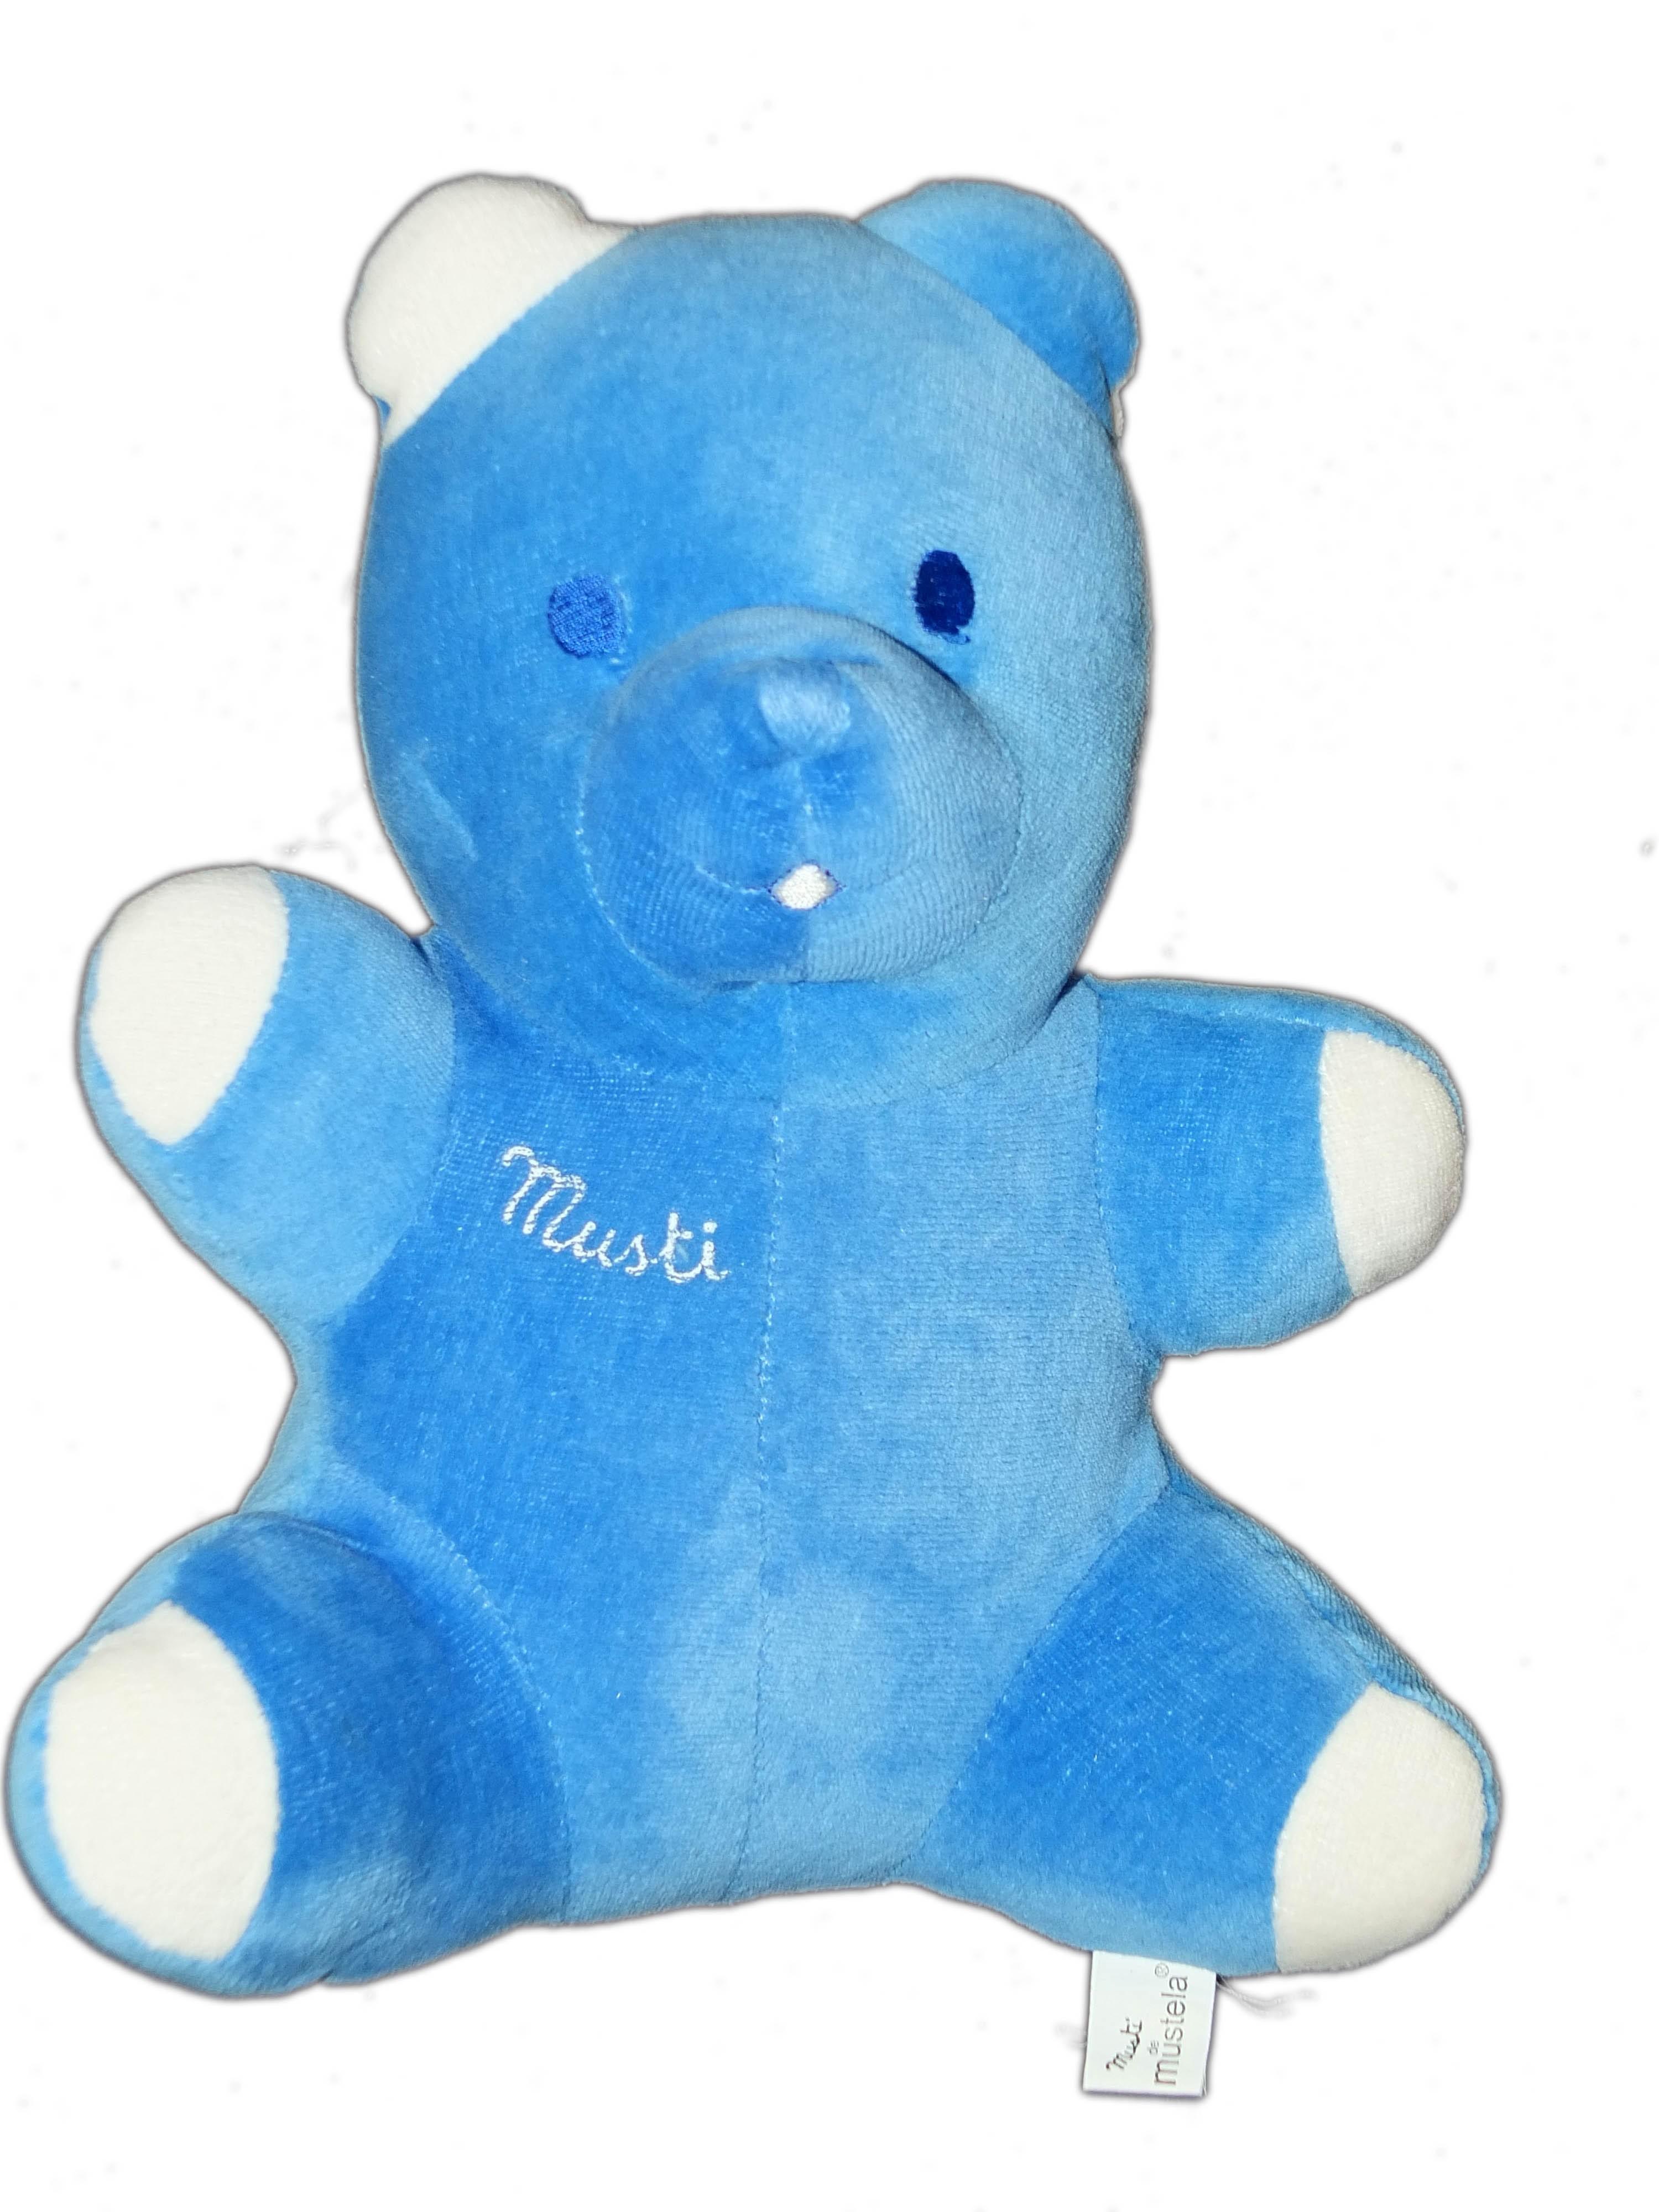 Bleu Doudou Ours Musti